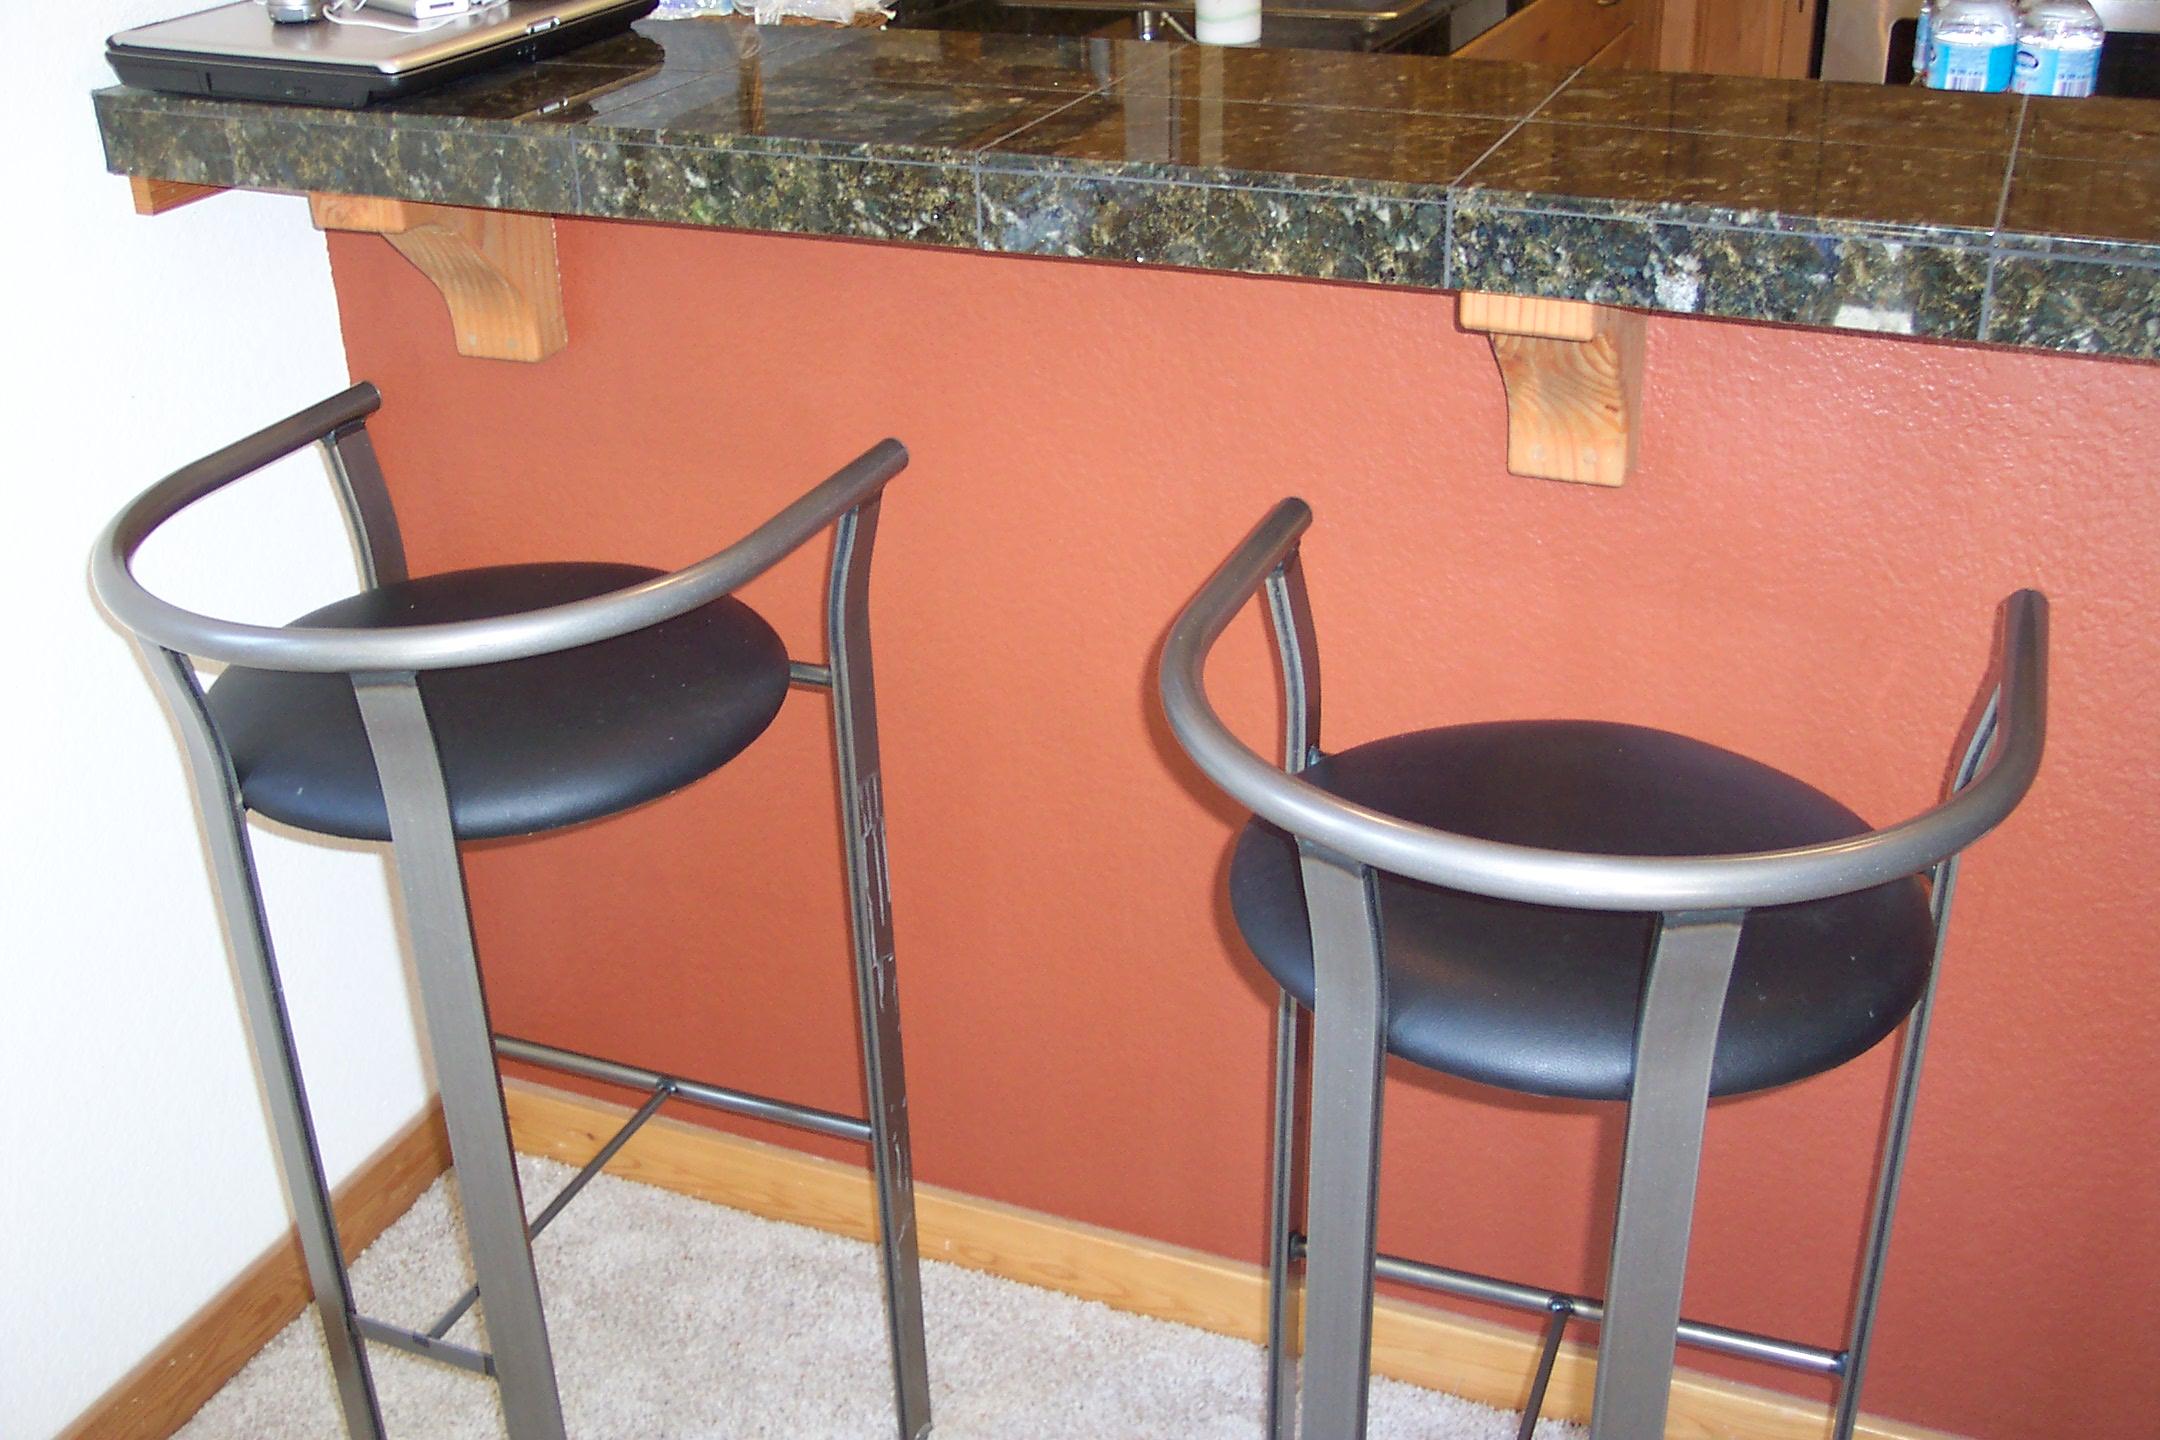 Kitchen bar stools Photo - 5